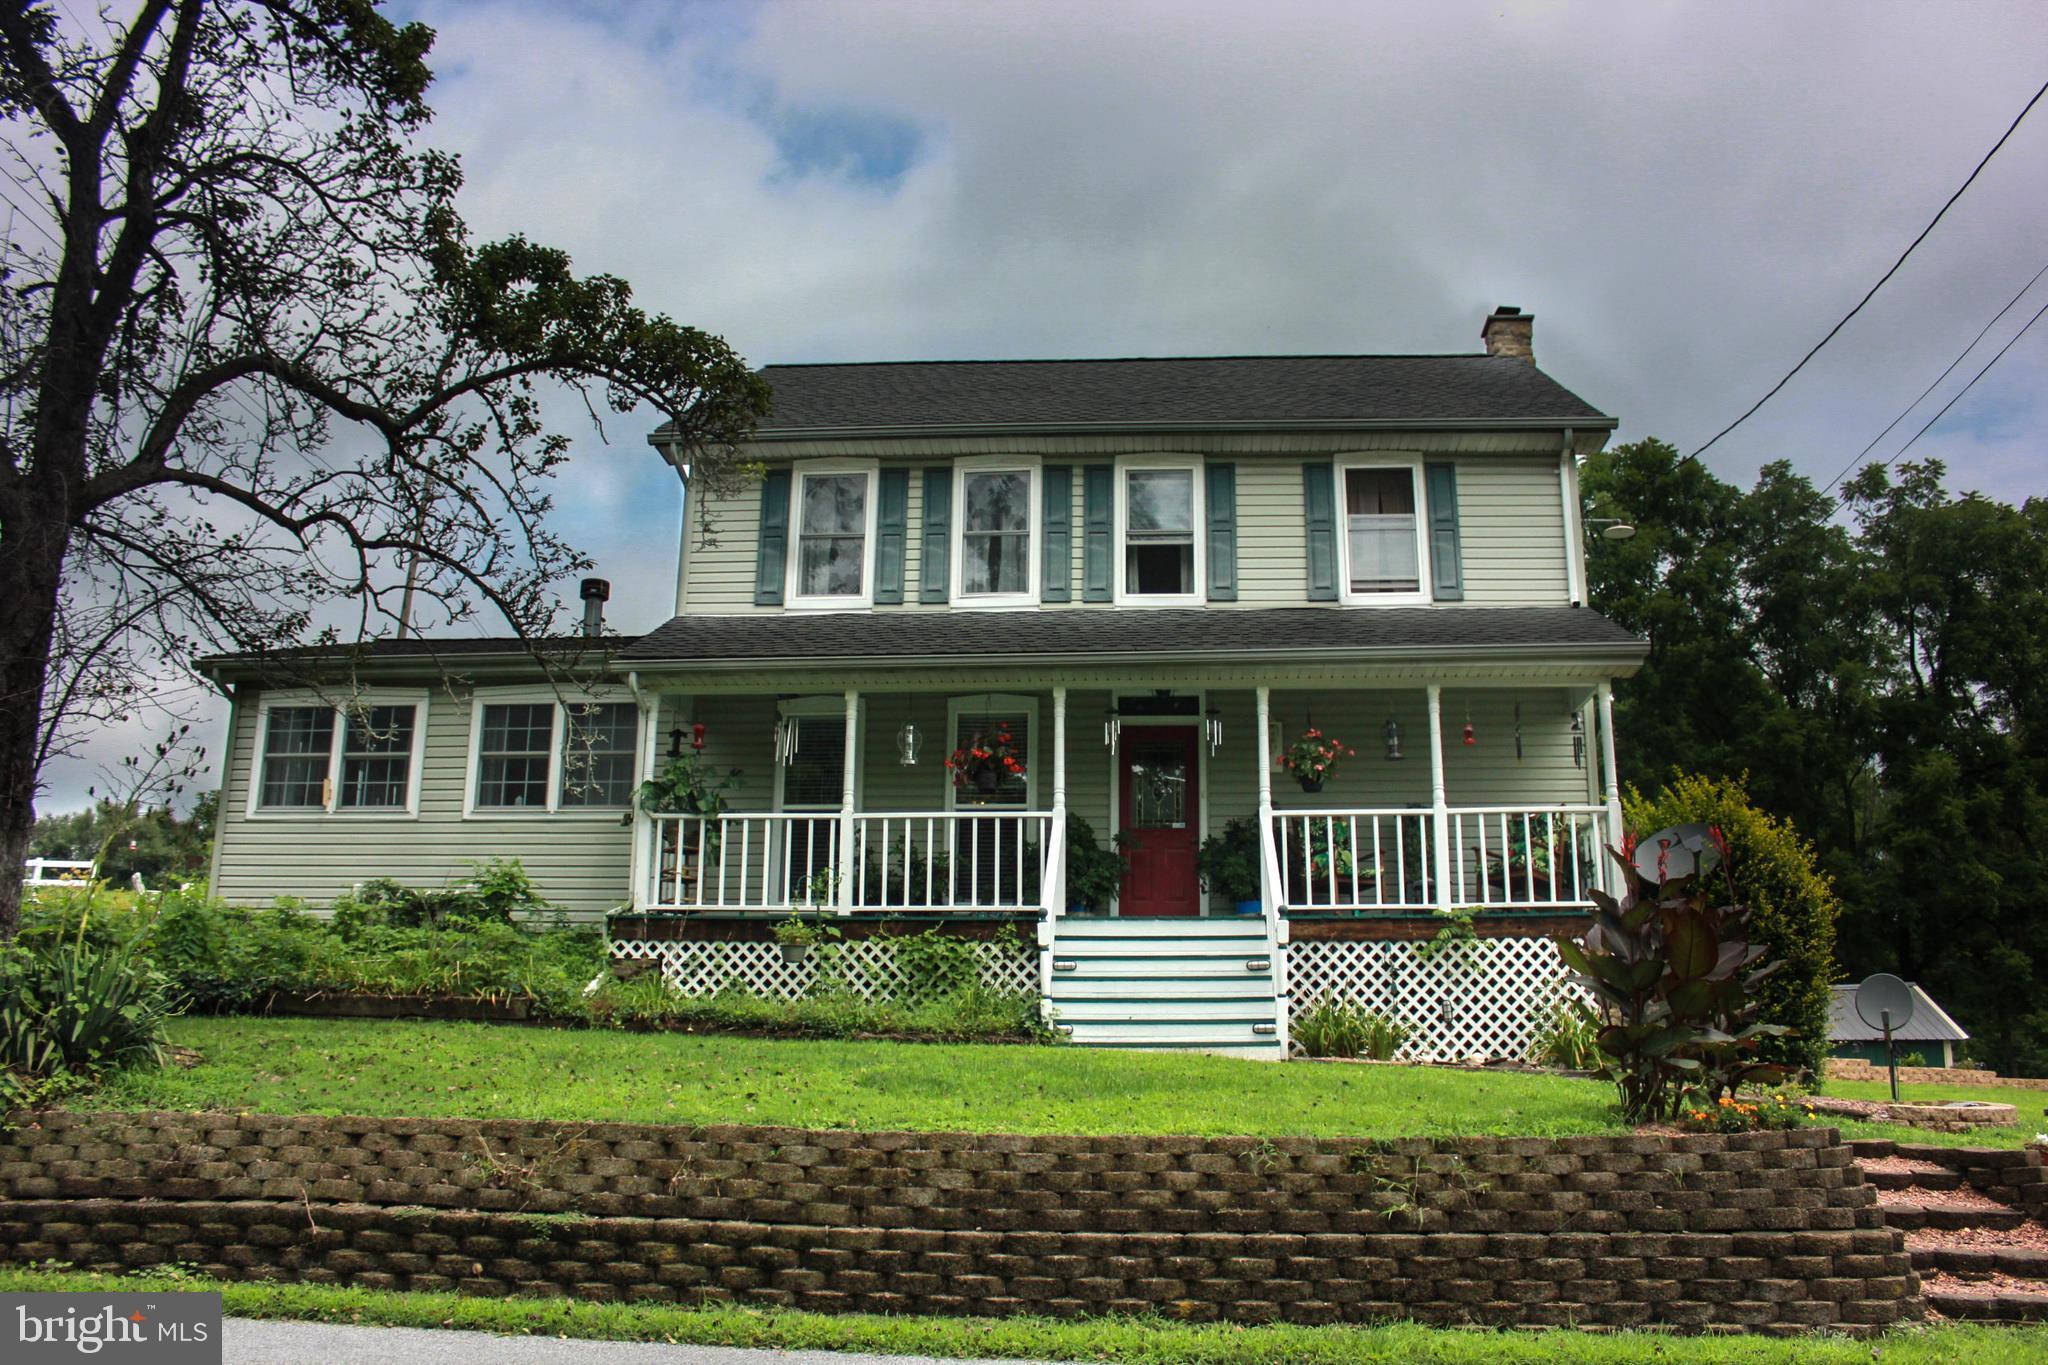 3543 BLACKSMITH ROAD, NEW TRIPOLI, PA 18066